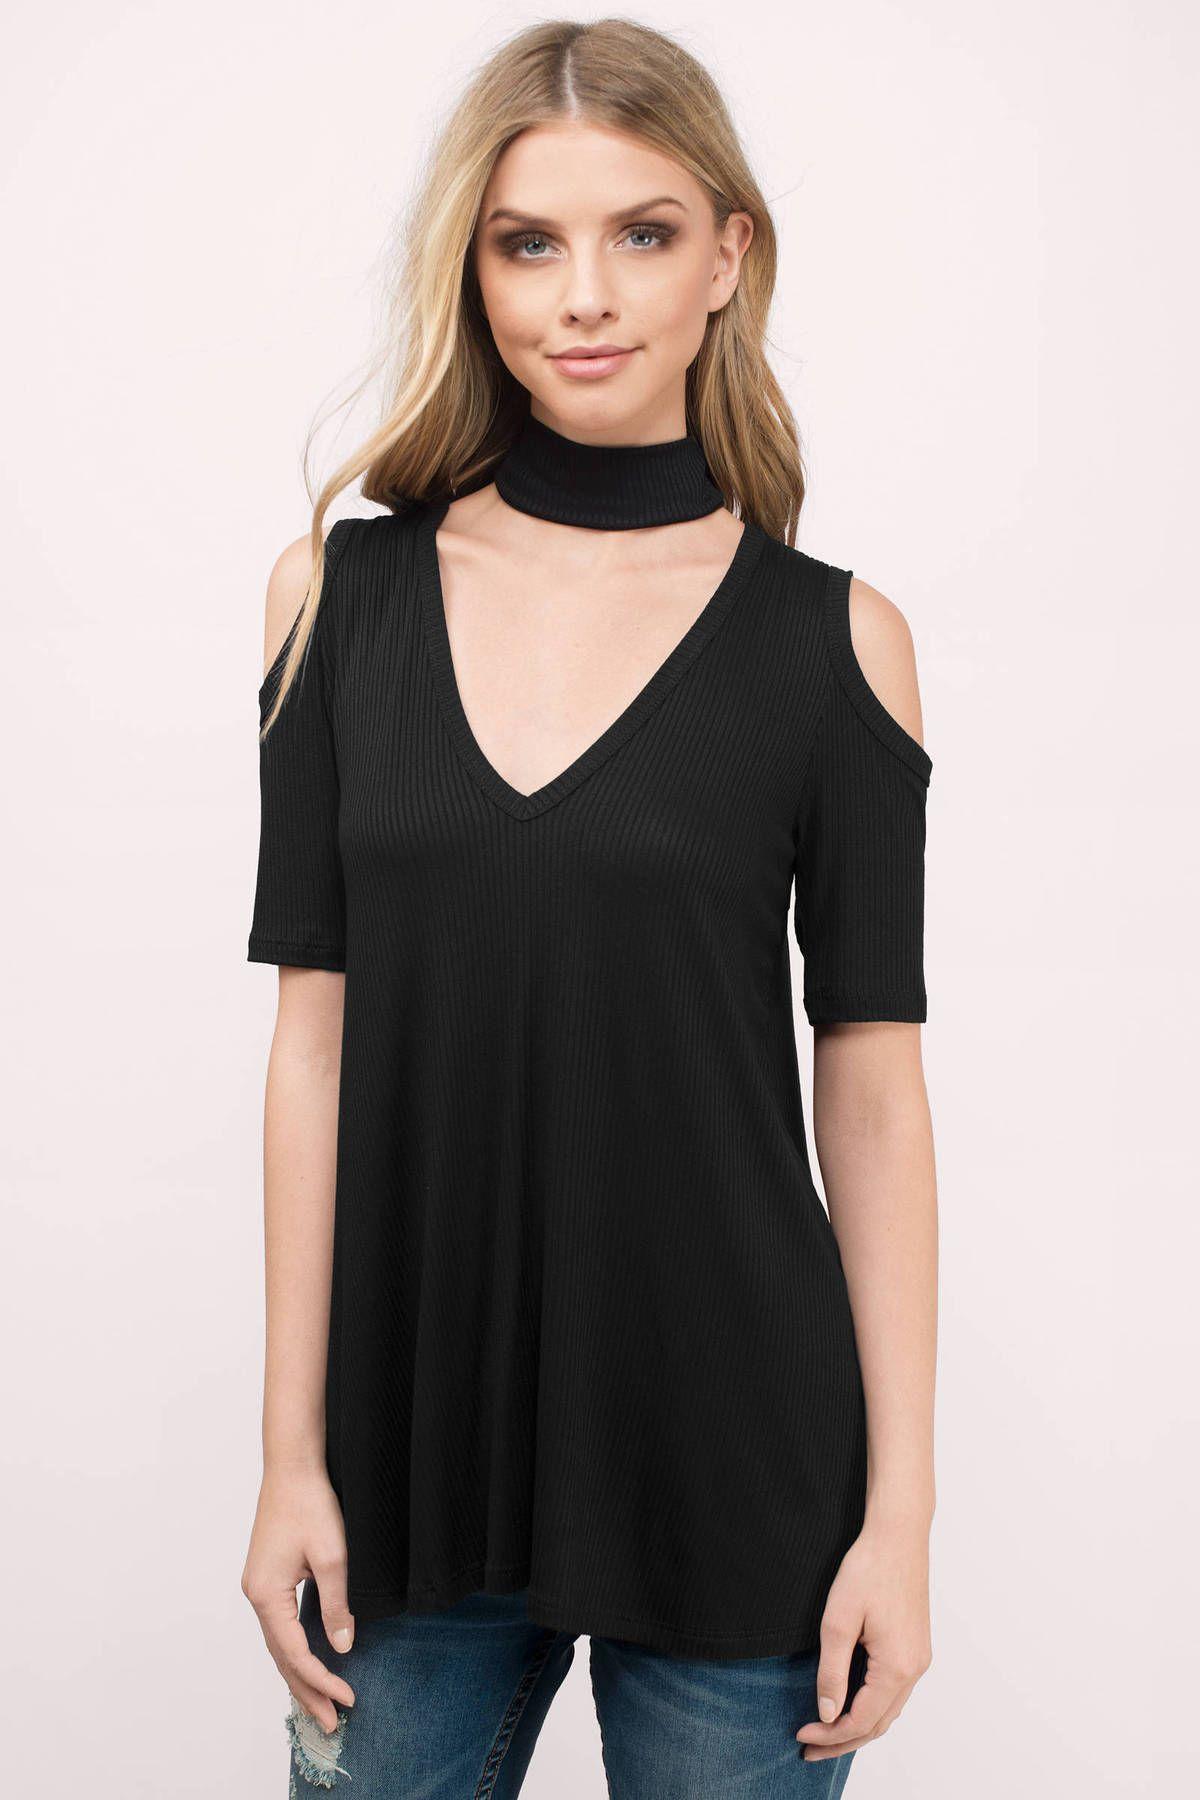 7b57470828c3c Bethany Cold Shoulder Choker Top at Tobi.com  shoptobi